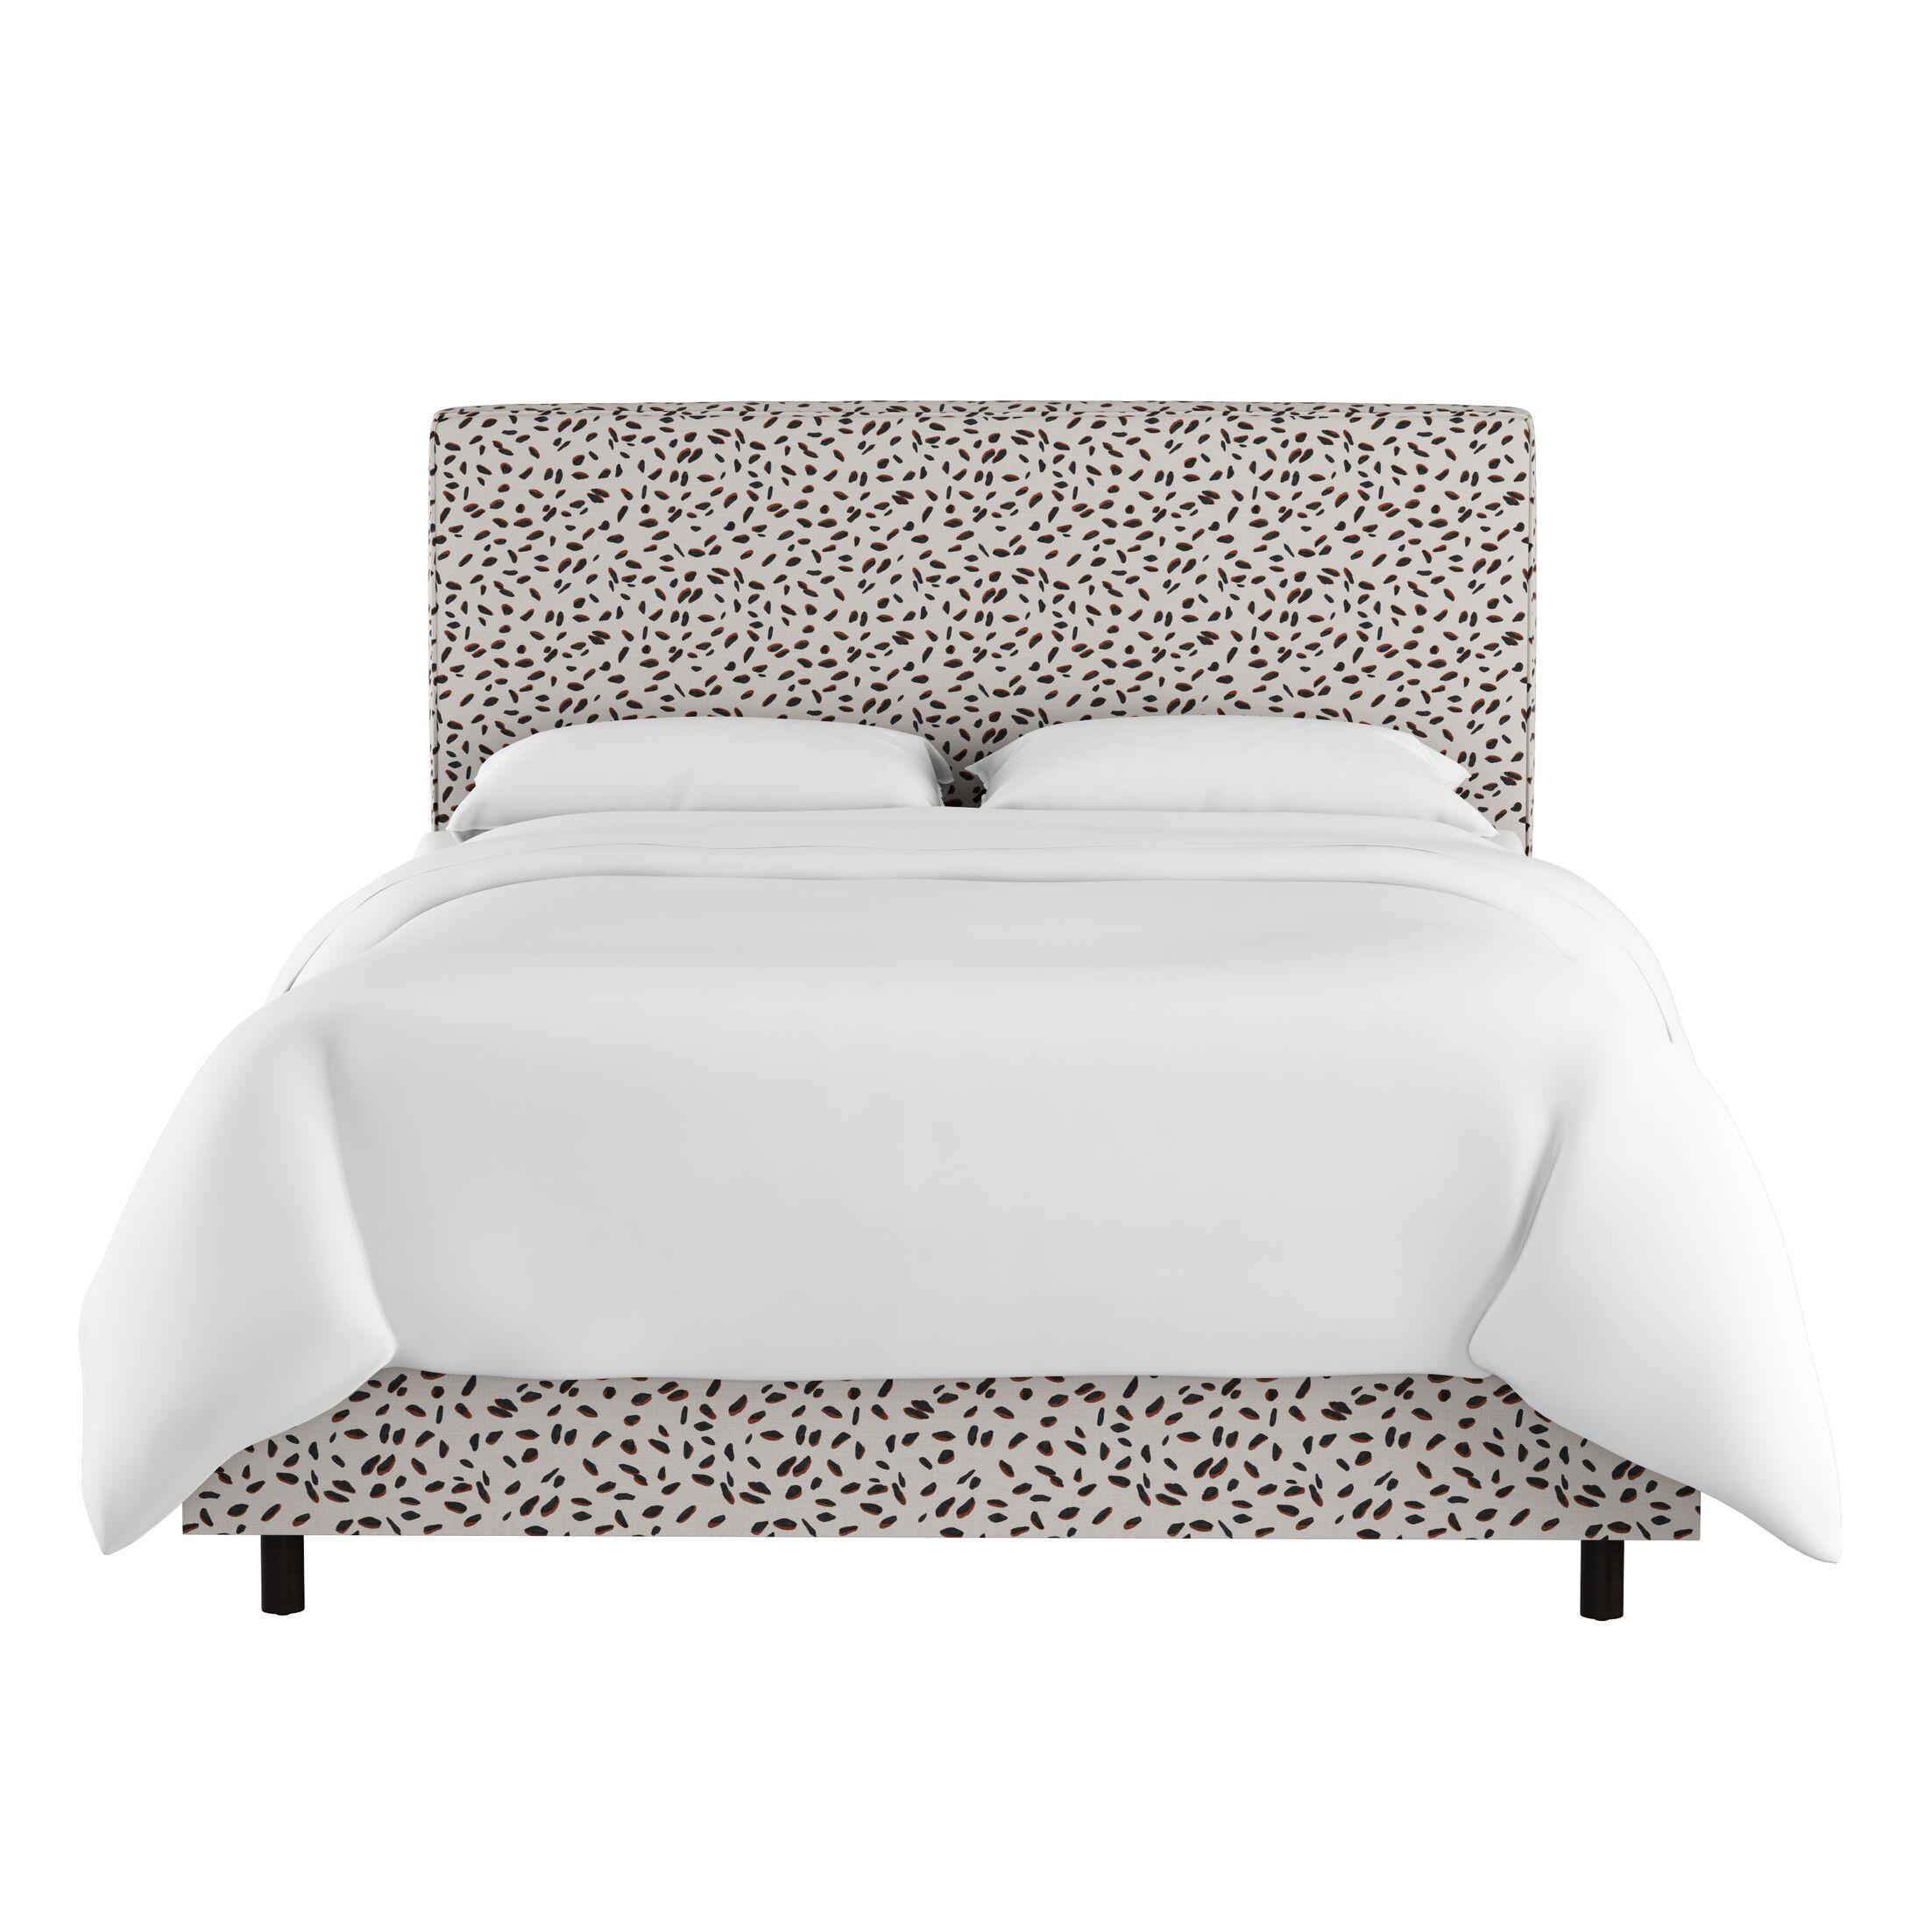 Marksbury Upholstered Panel Bed Size: King